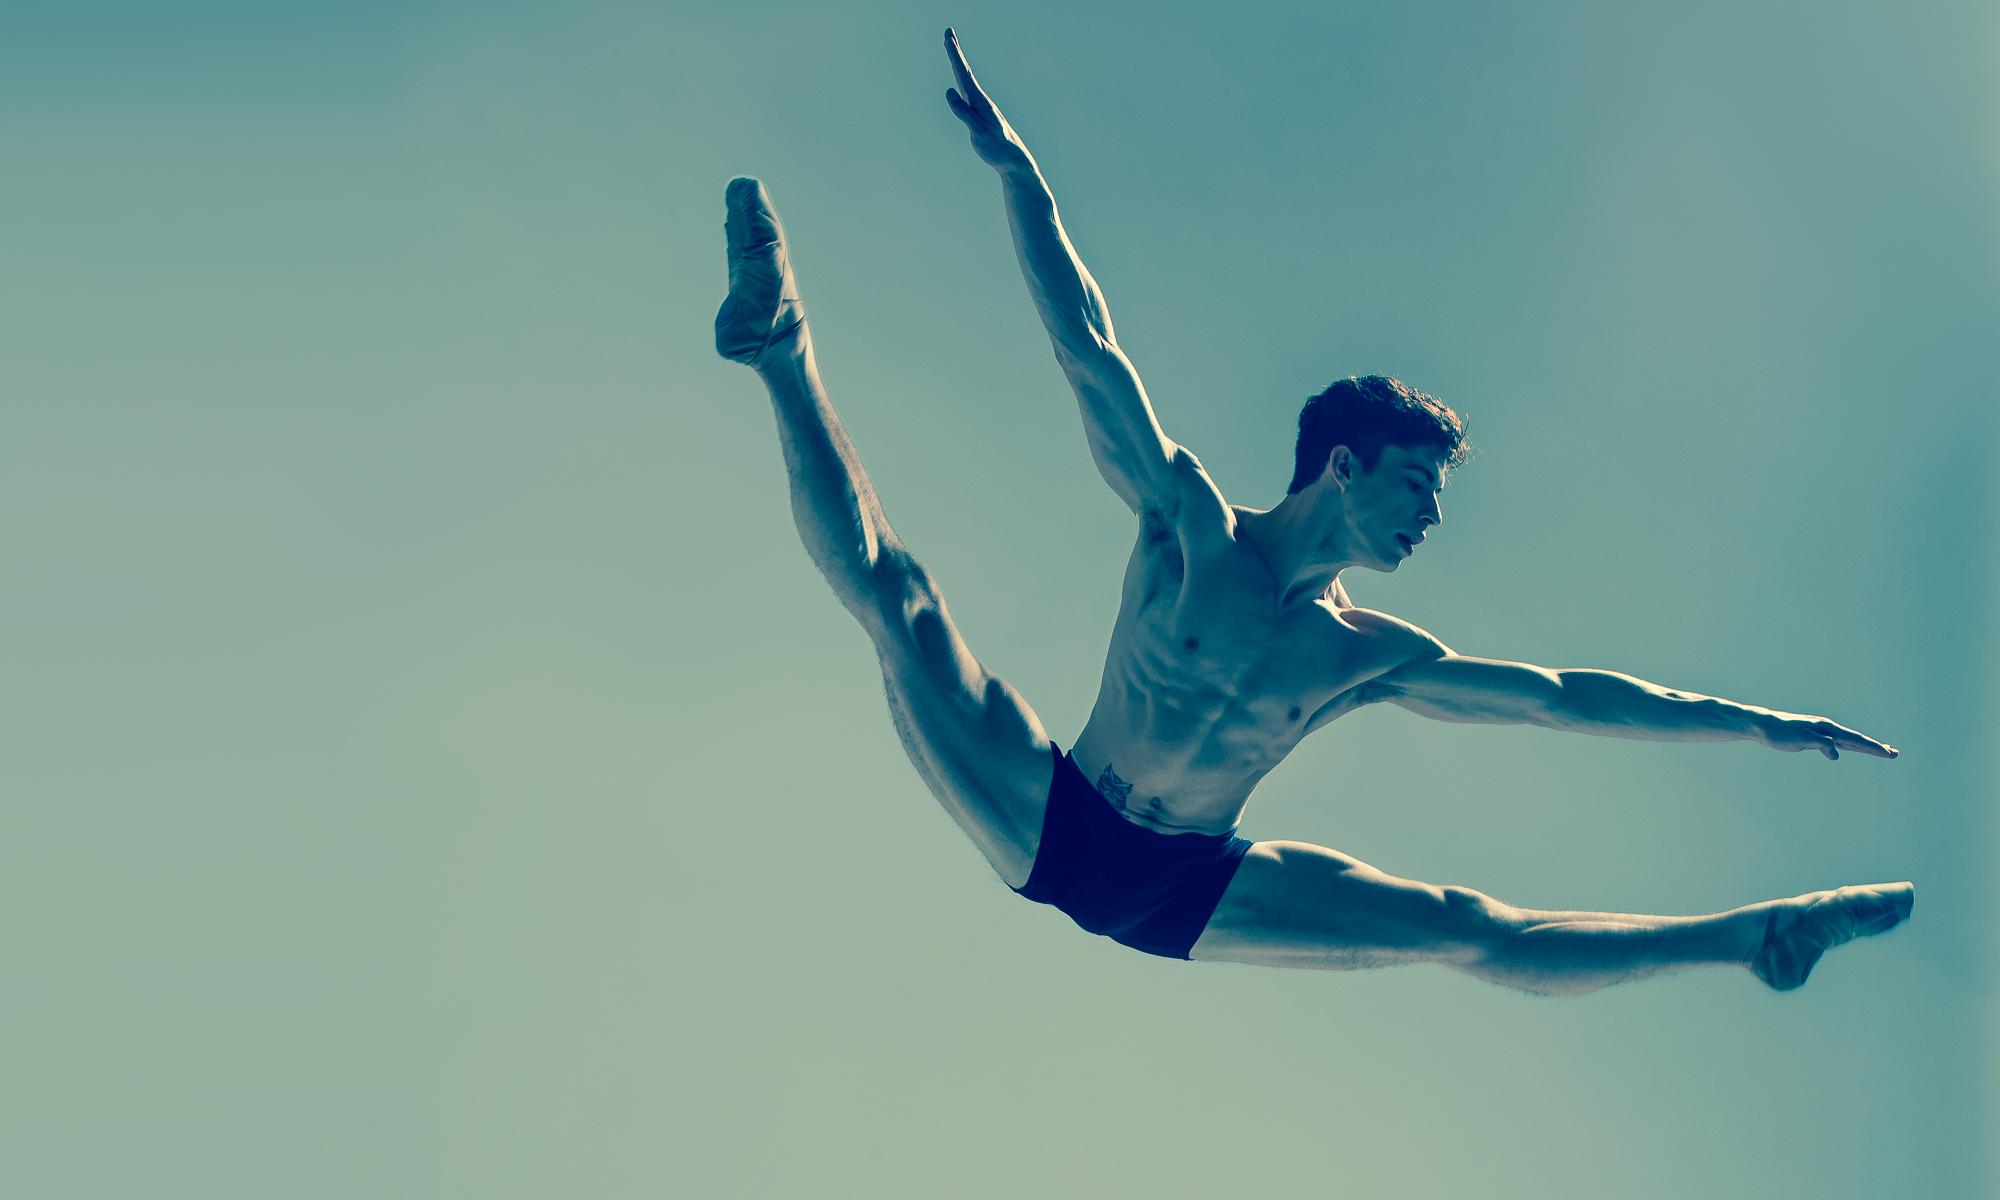 Chris-Conroy-Photography-3